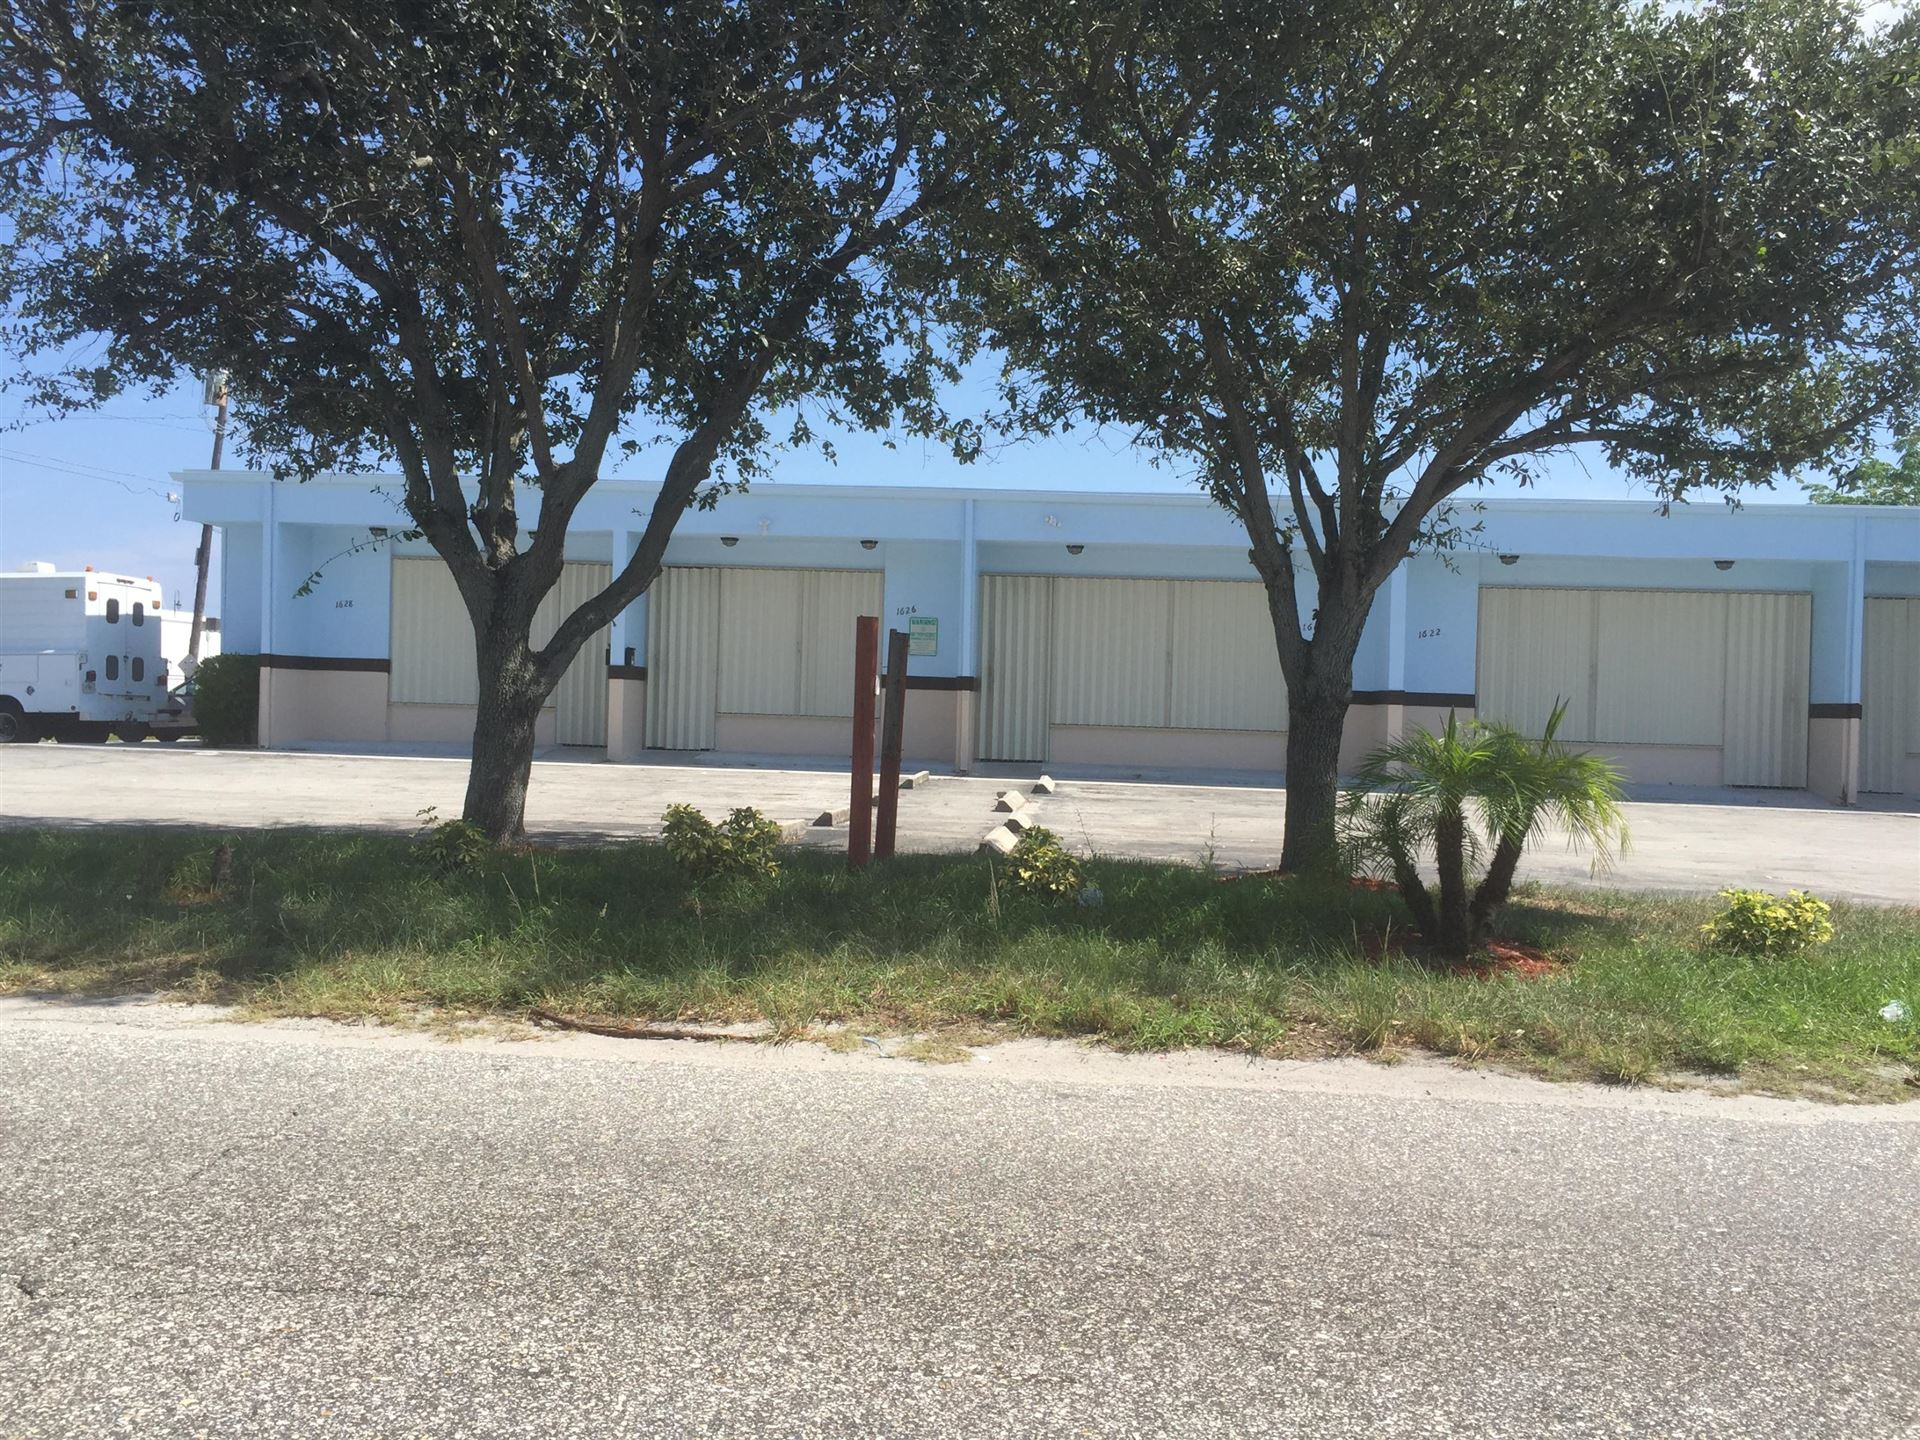 Photo of 1620 Avenue E, West Palm Beach, FL 33404 (MLS # RX-10451867)